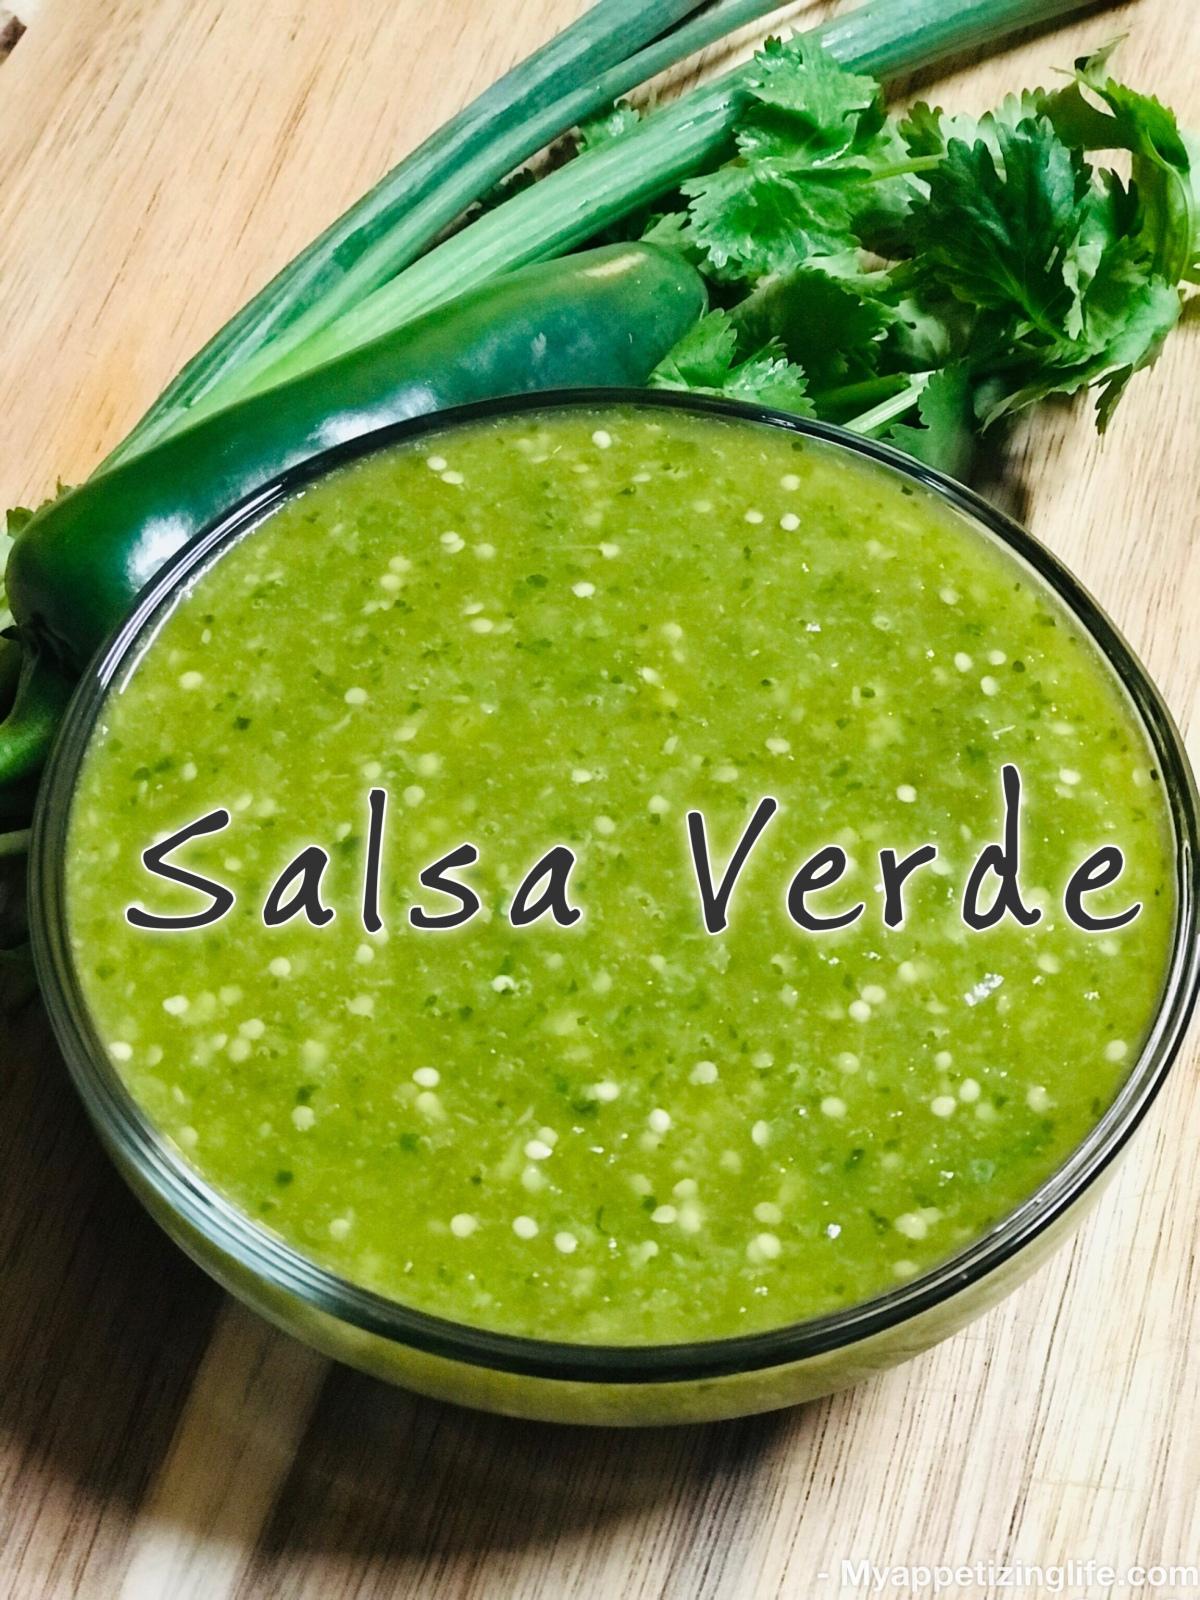 Erika's Salsa Verde